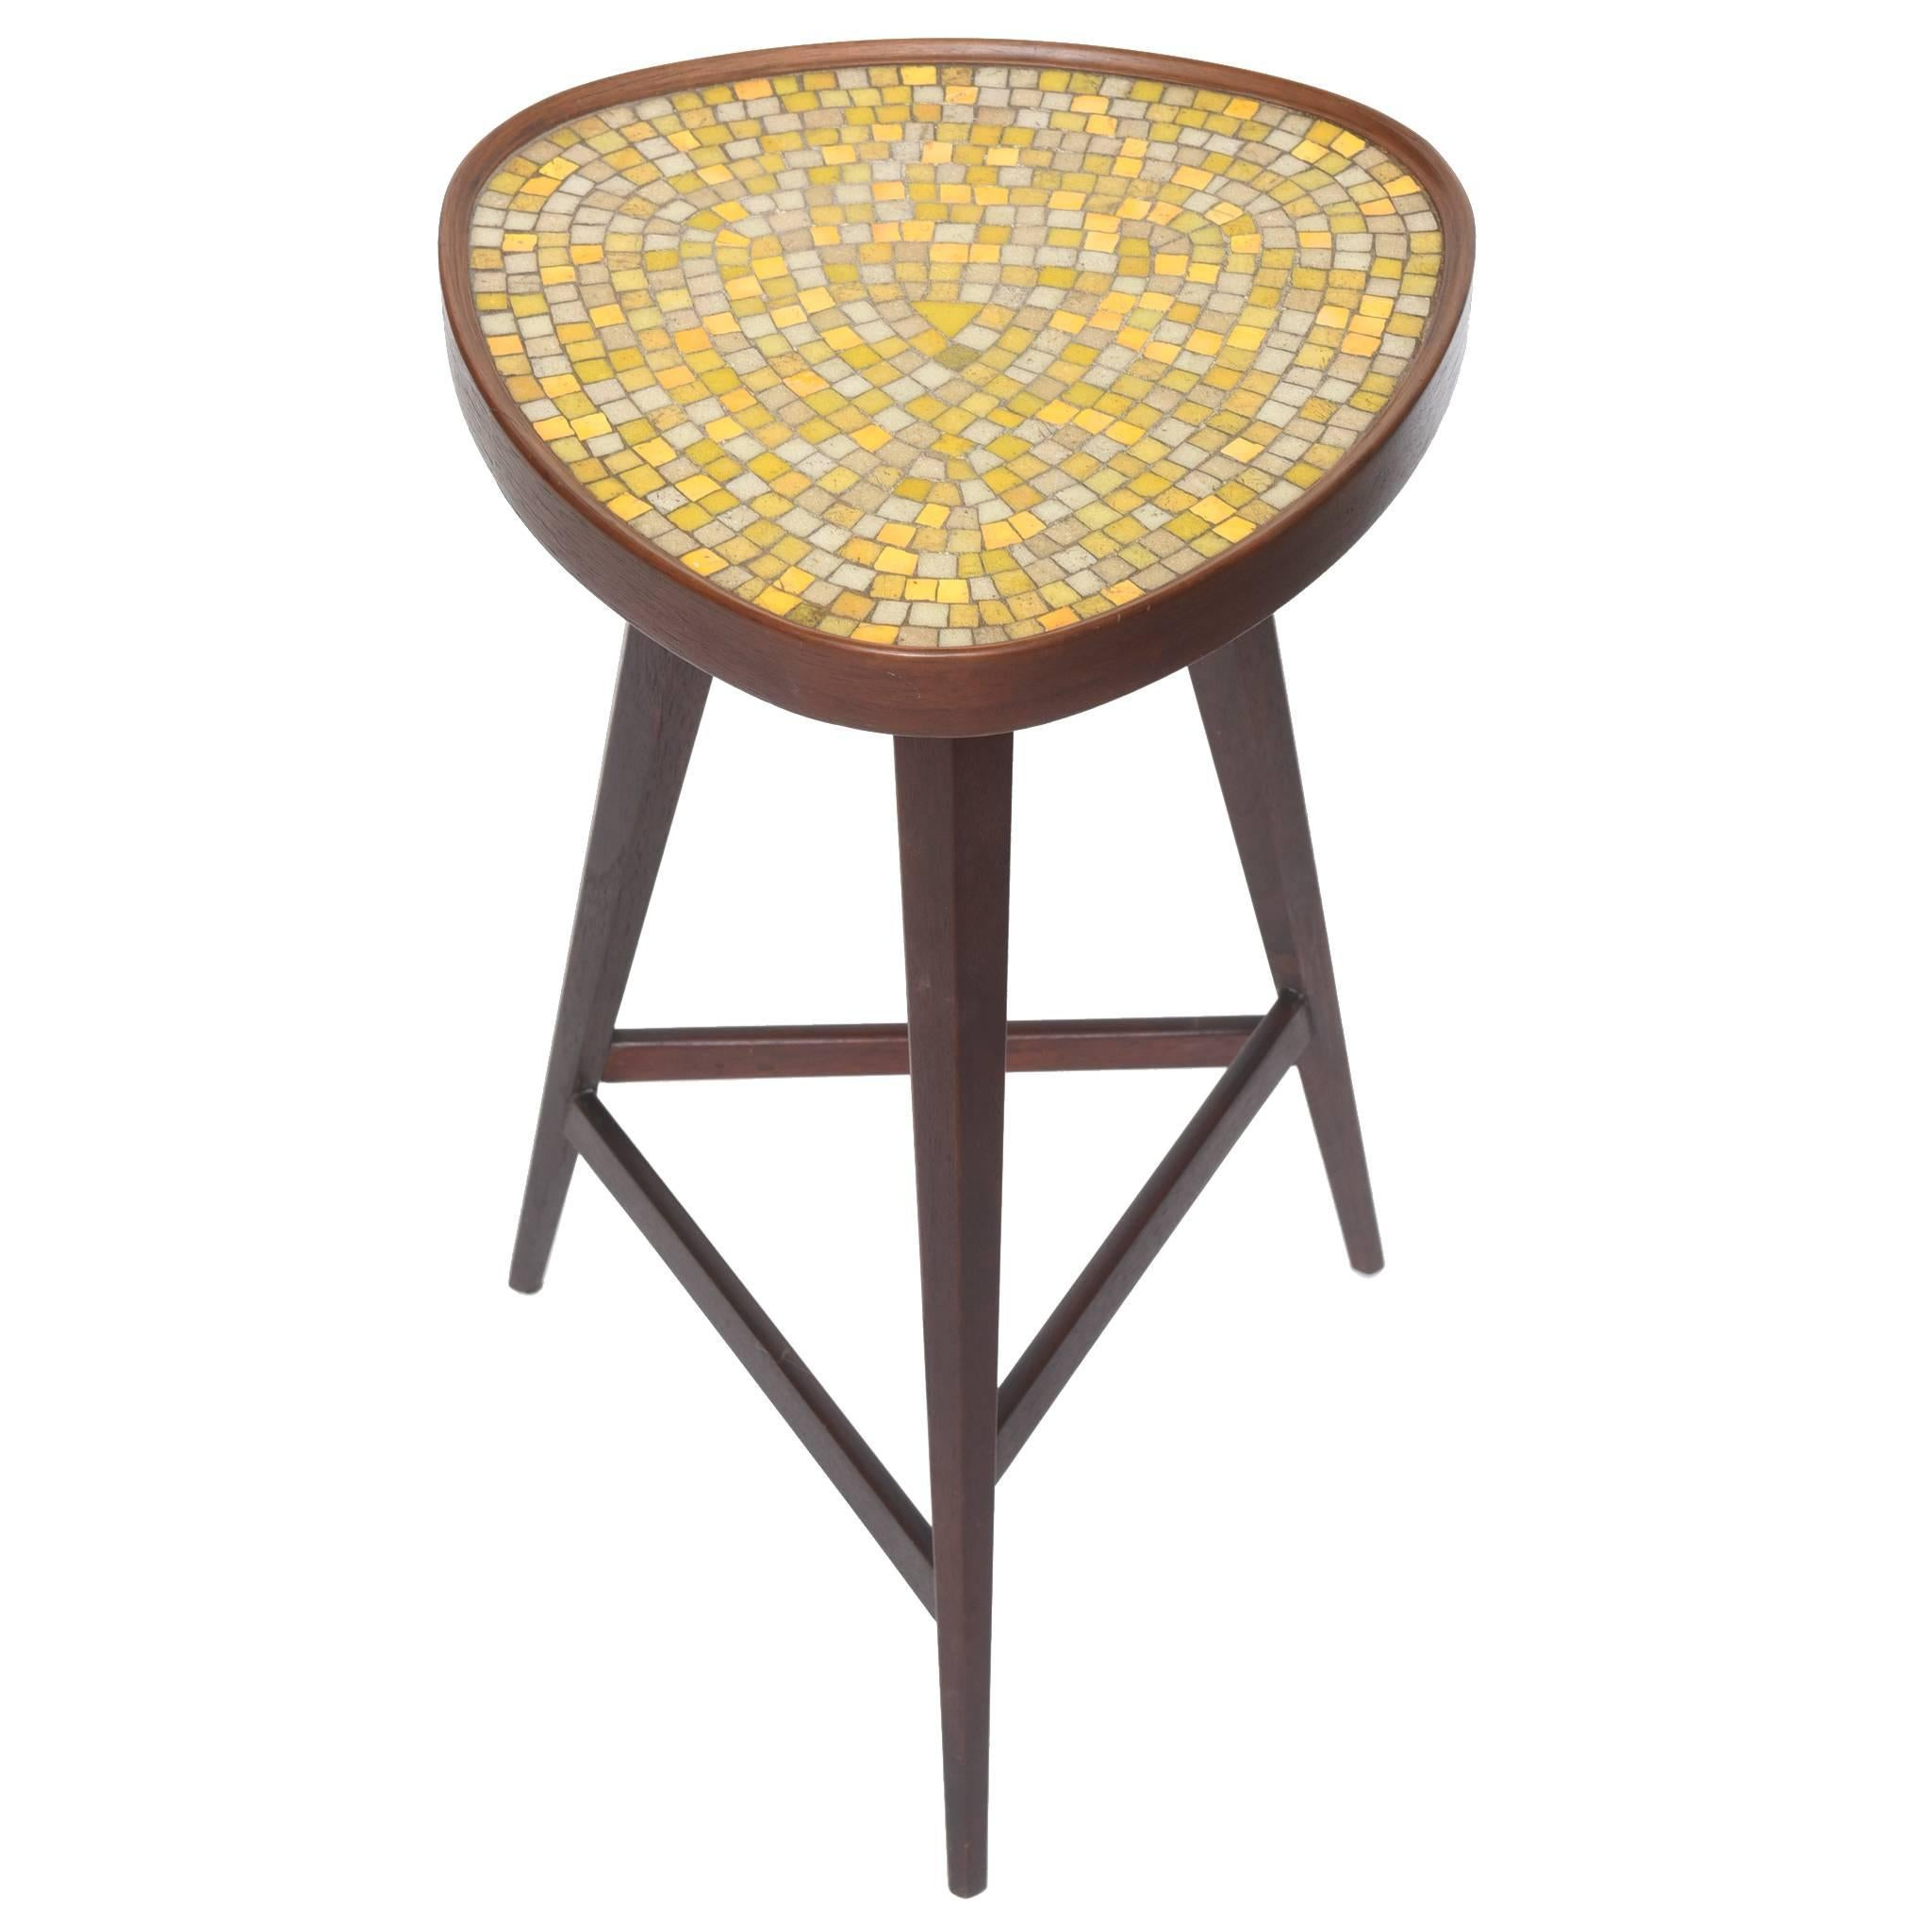 Edward Wormley Murano Glass Tile Top Table